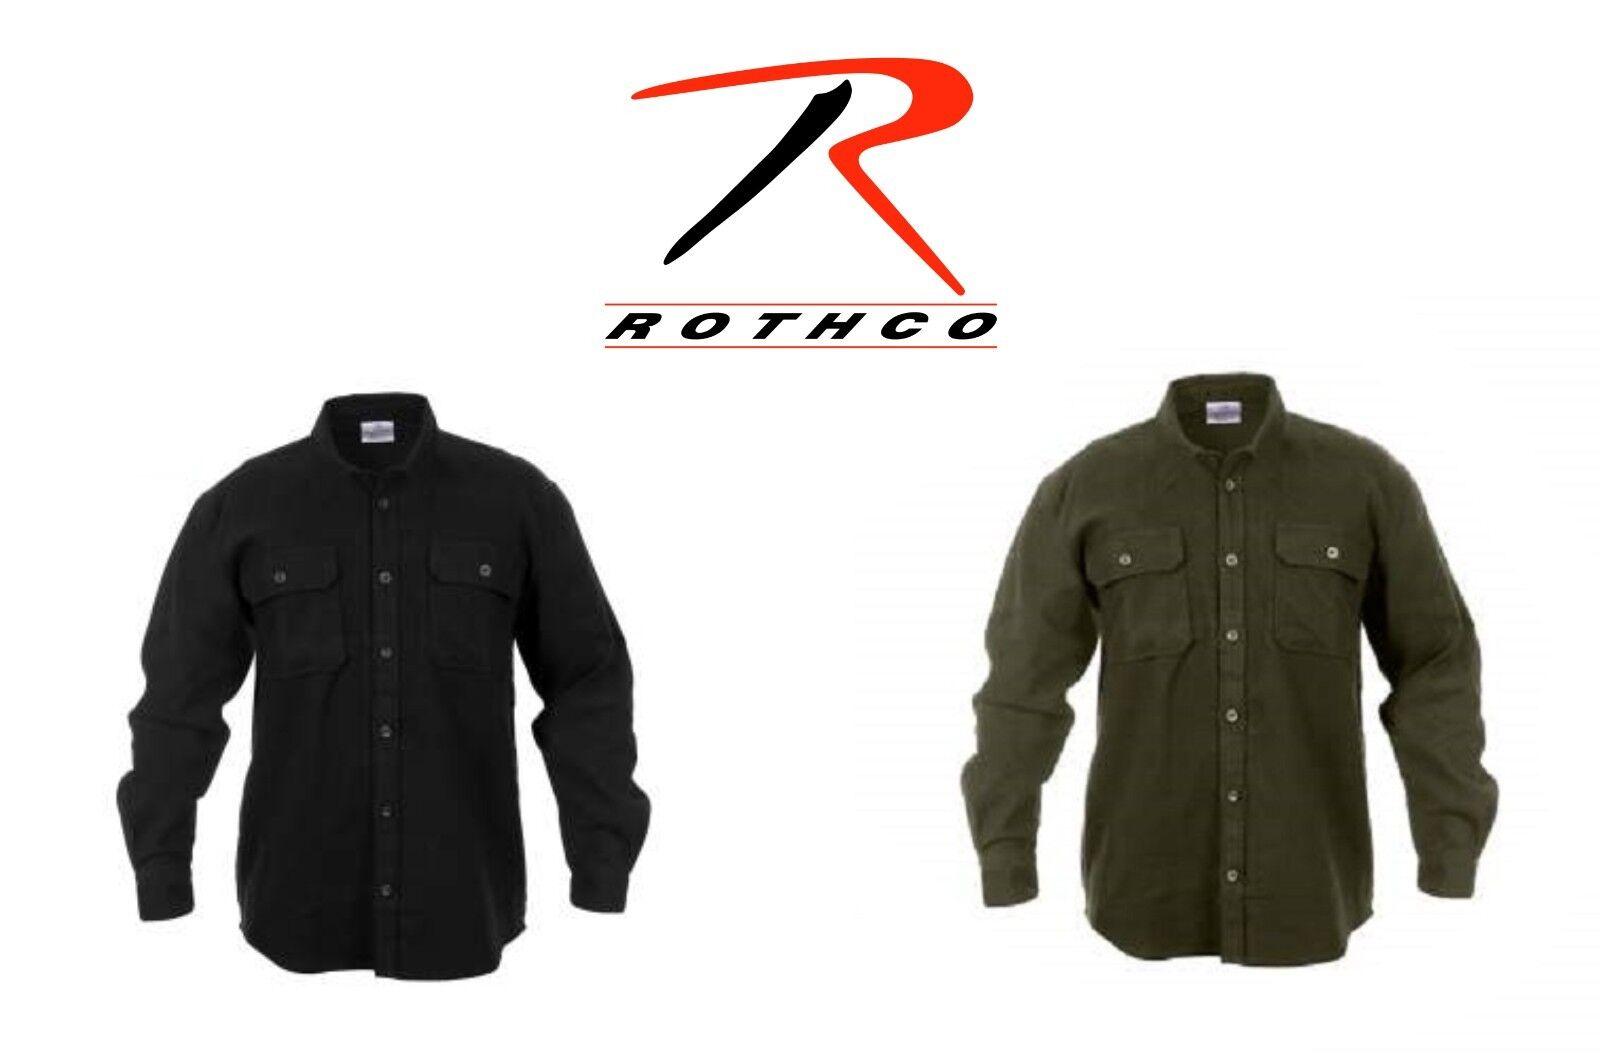 Rothco's Buffalo Heavyweight Mens Solid Black or Olive Green